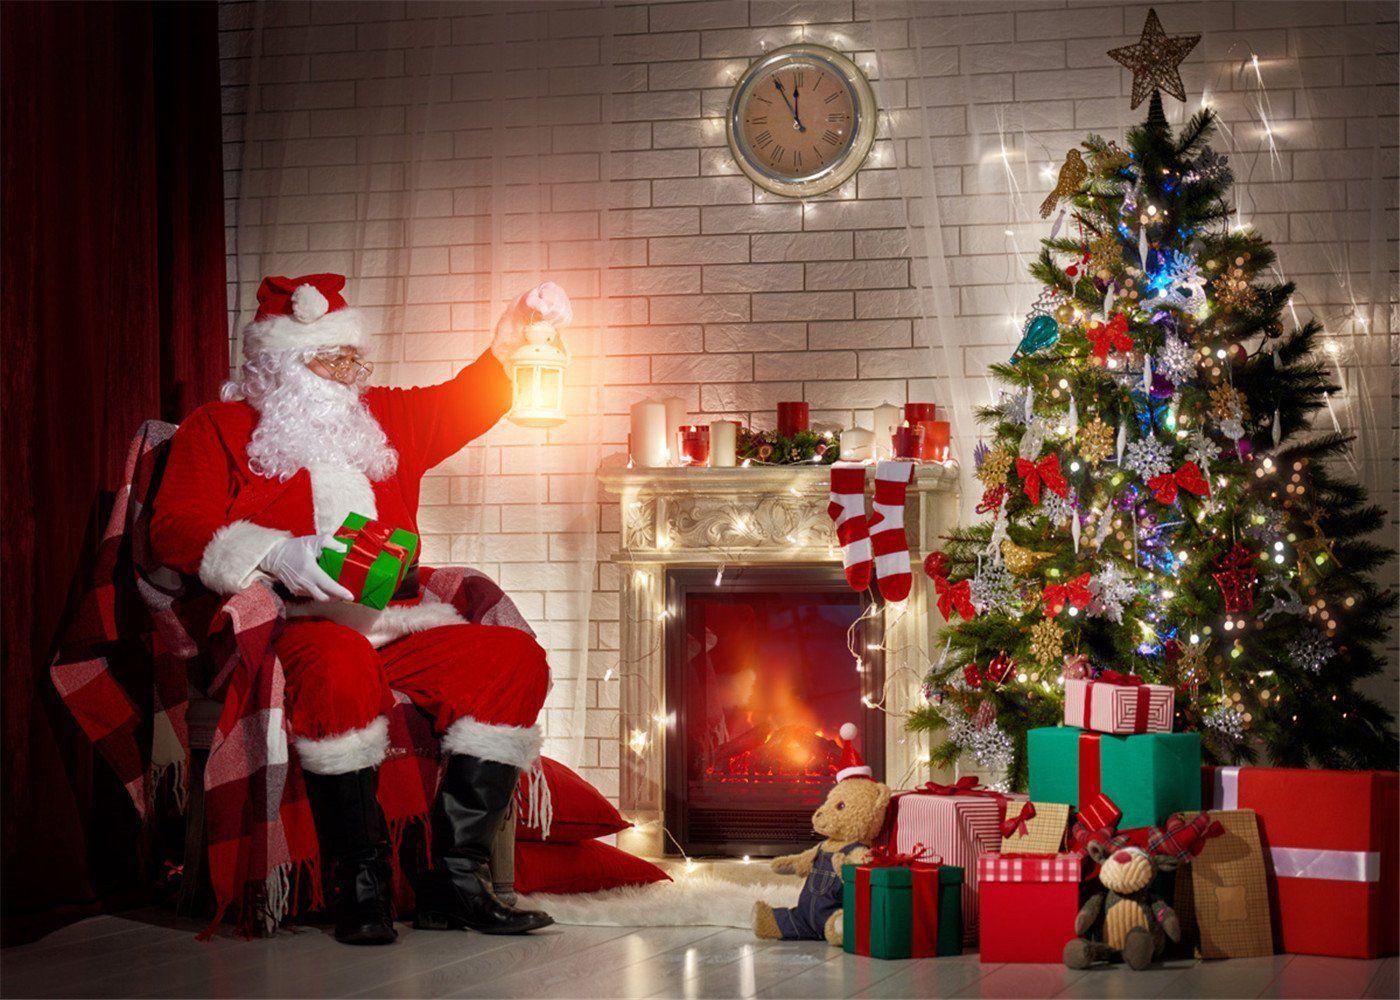 7x5ft Kate Digital Backdrop Christmas Tree Brick Background Santa Claus Indoor